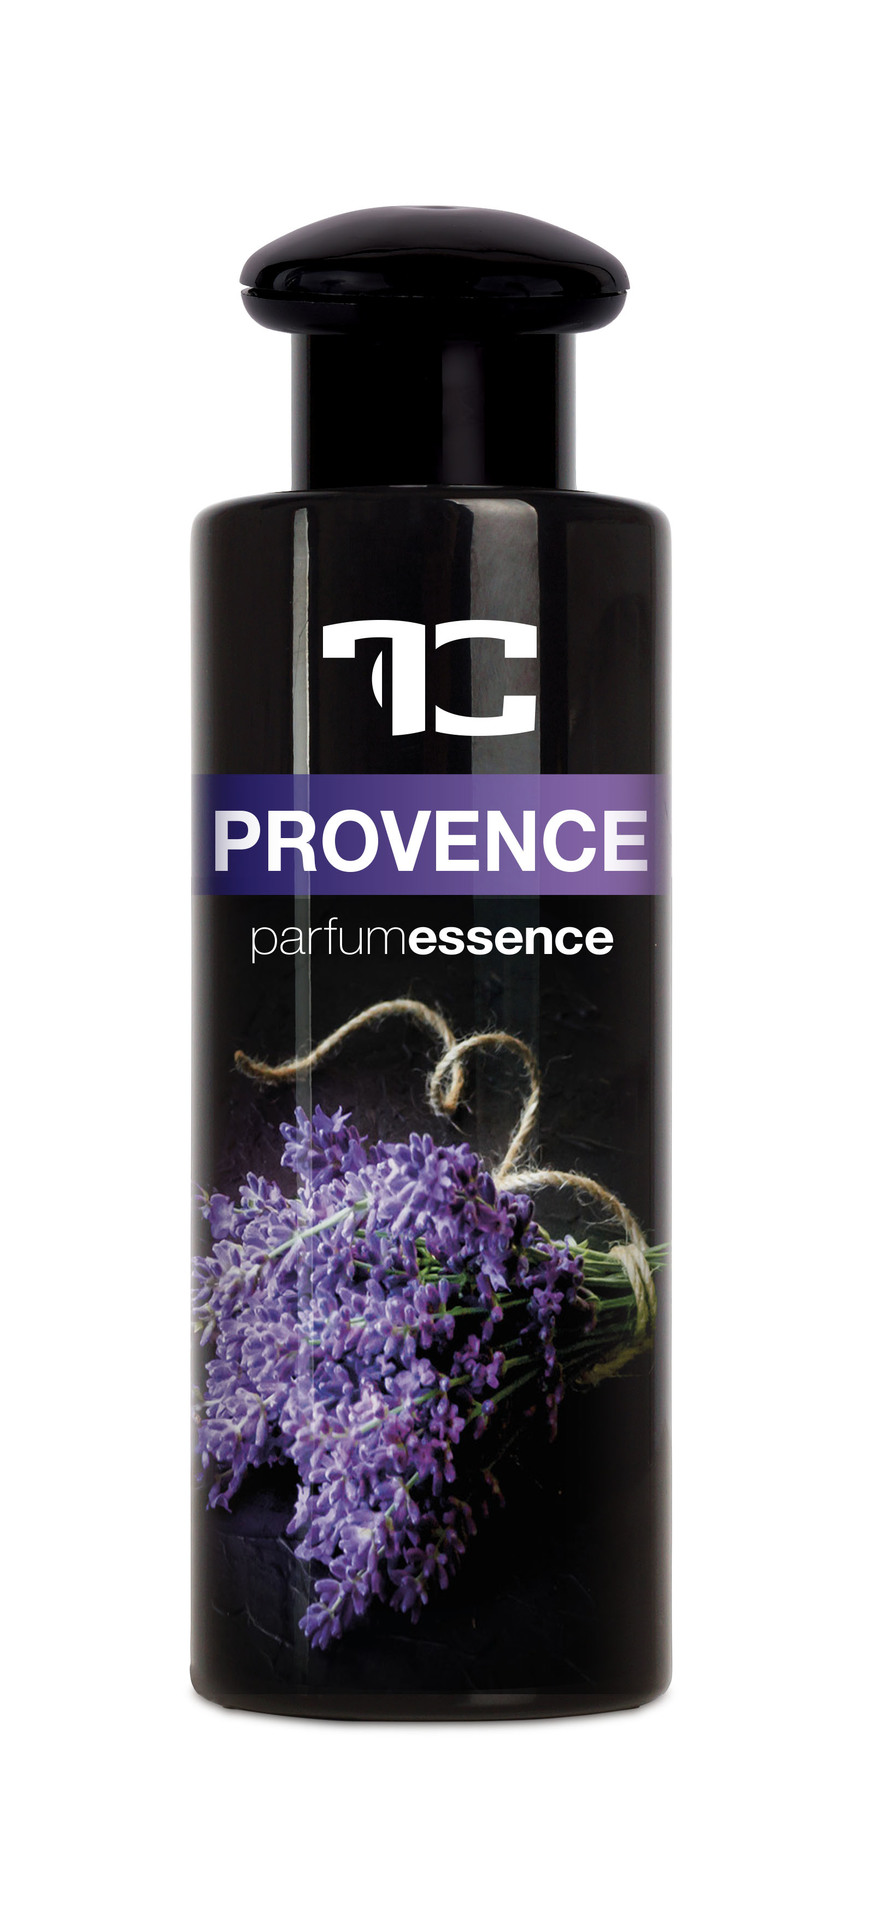 https://dedra.blob.core.windows.net/cms/ContentItems/2862_parfum-essence-provence-koncentrovana-parfemova-esence/images/fc0389-provence-parfum-essence-black.jpg